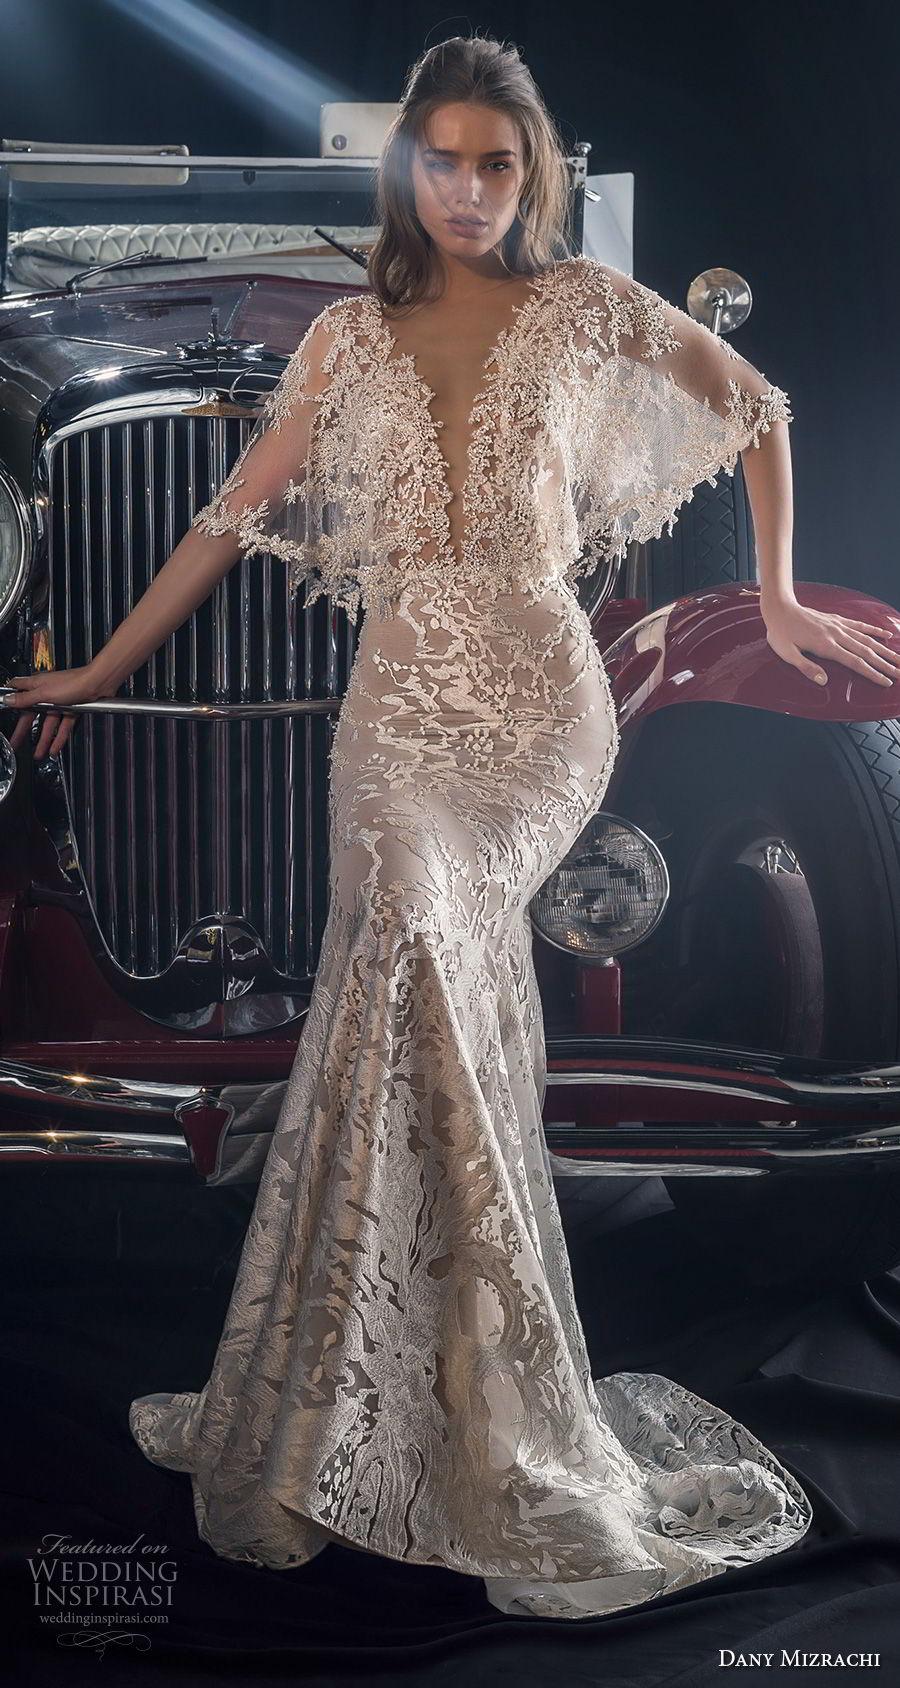 Dany mizrachi fall 2018 wedding dress wedding inspirasi for Butterfly back wedding dress